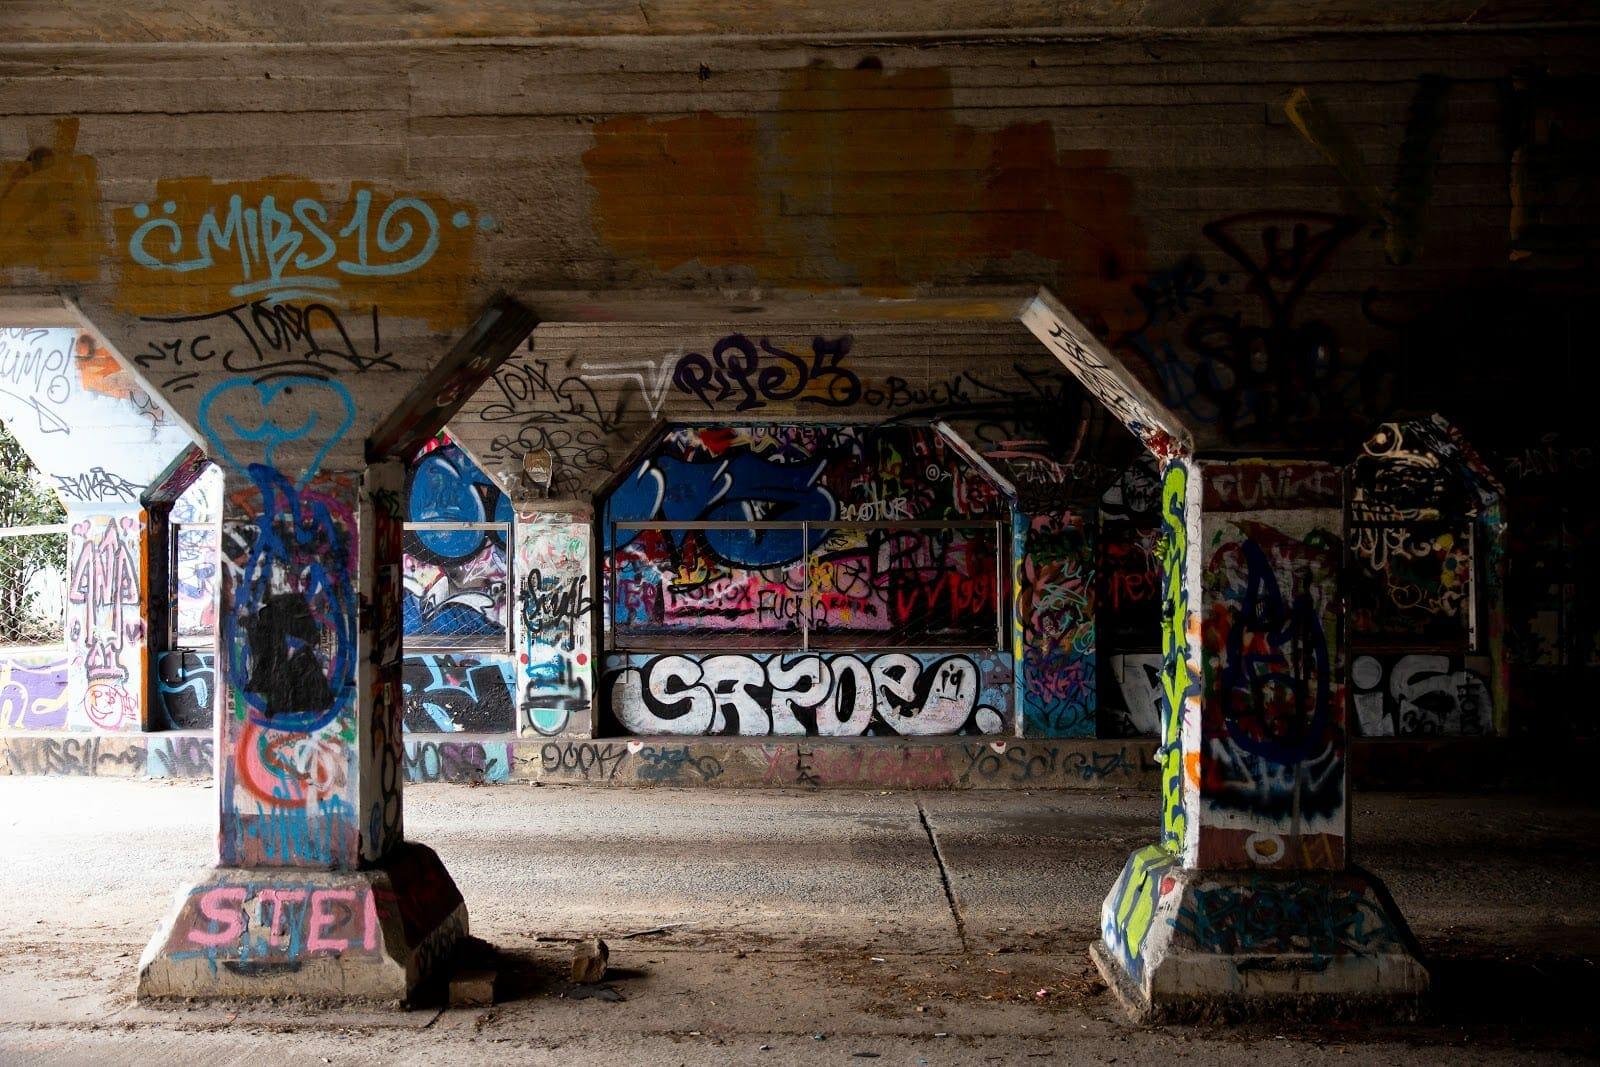 The Krog Tunnel in Cabbagetown.